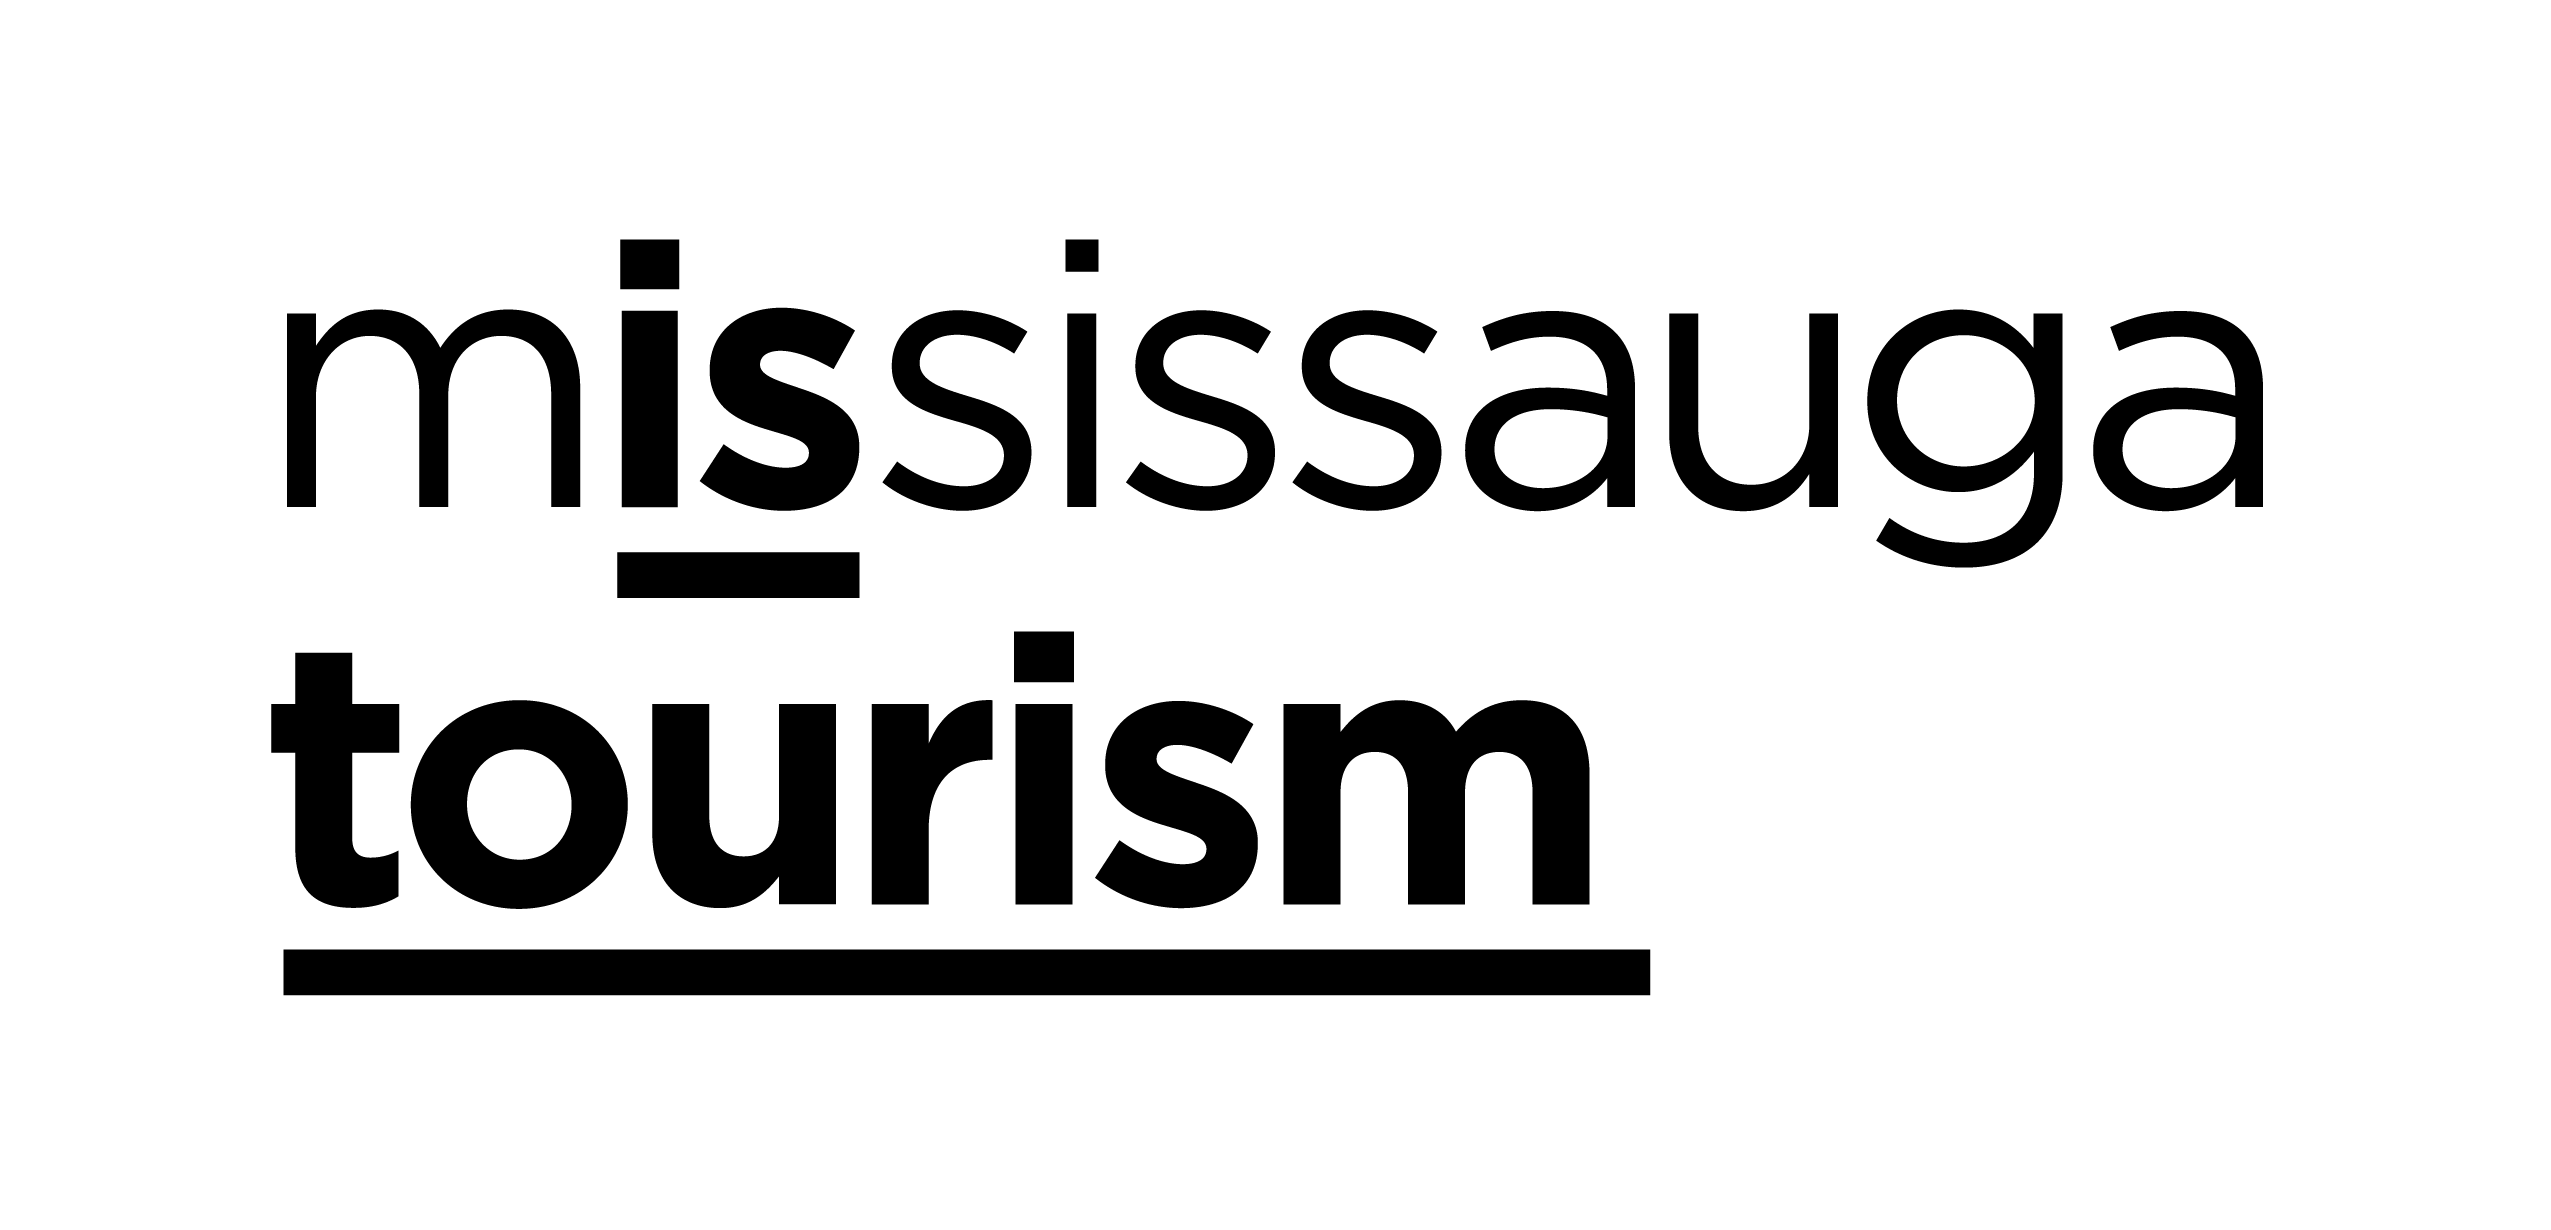 Mississauga Tourism - Black Text